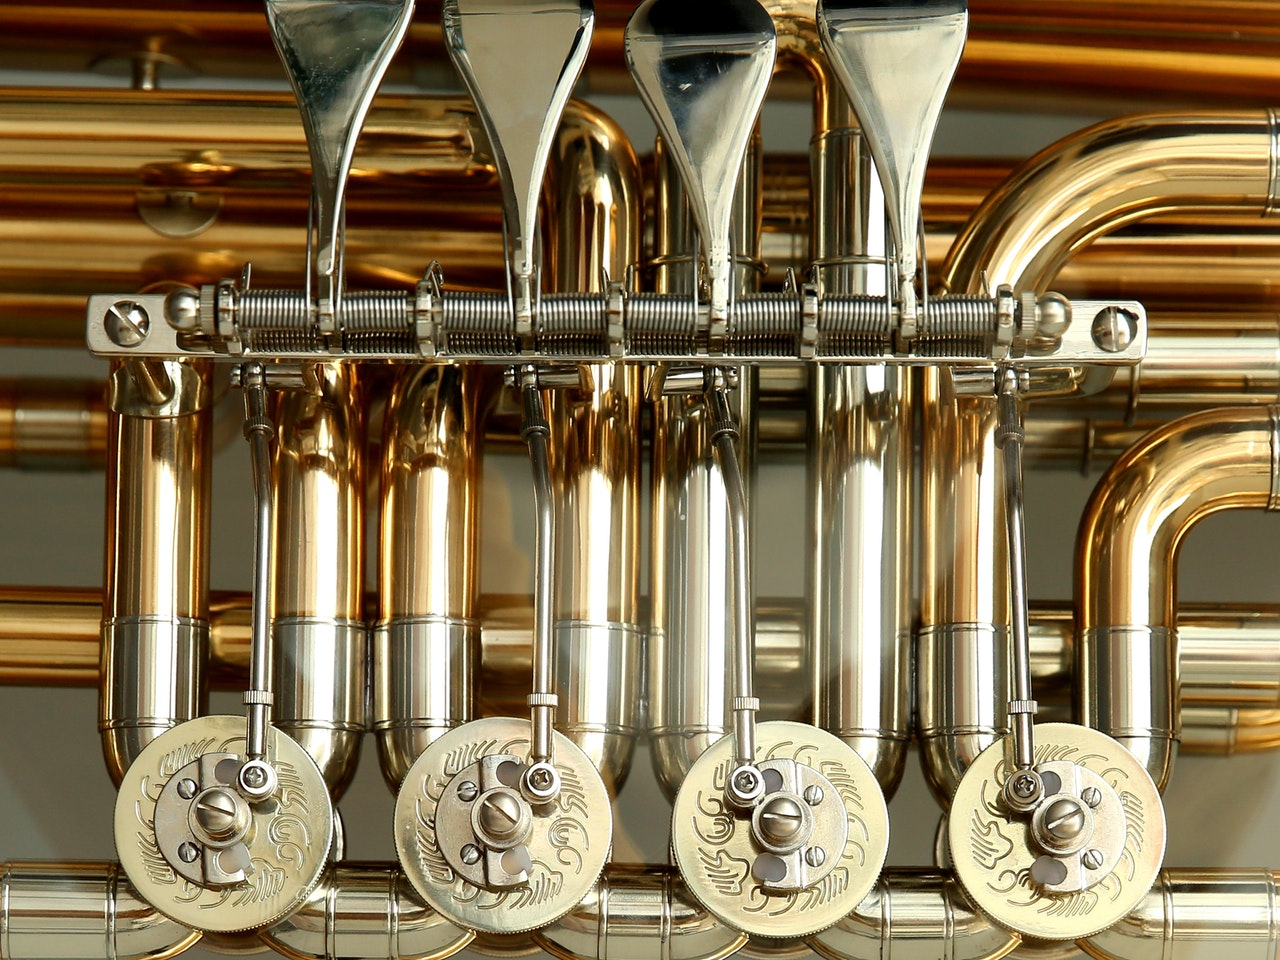 rotary-valves-tuba-valves-stimmzug-51932.jpeg